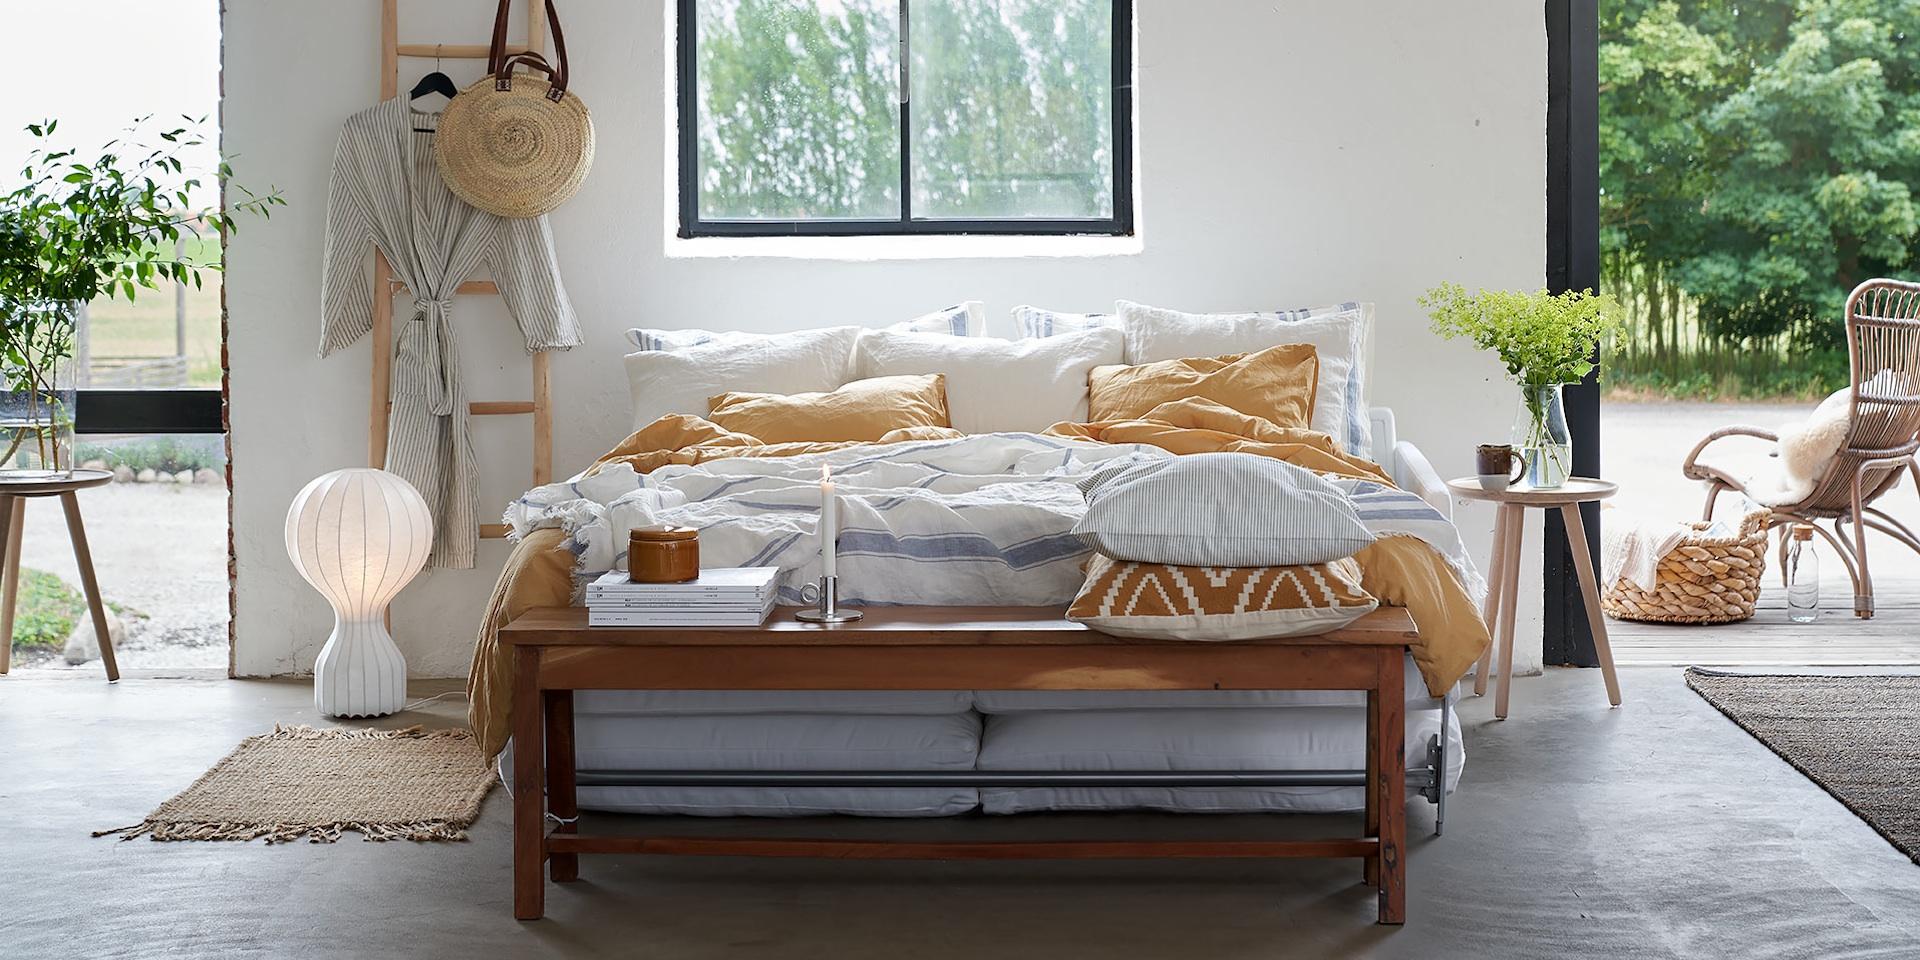 LUKAS_arrangement_sofa_bed4_caleido1420_white_6